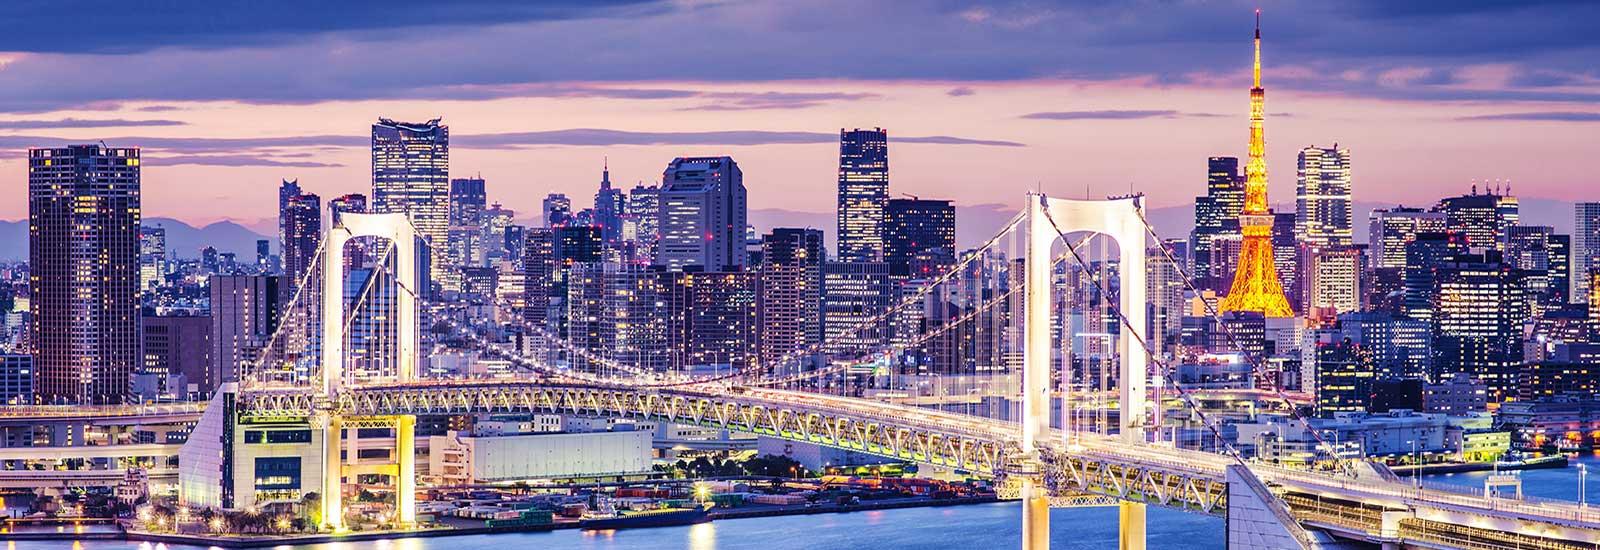 rainbow bridge tokyo tower